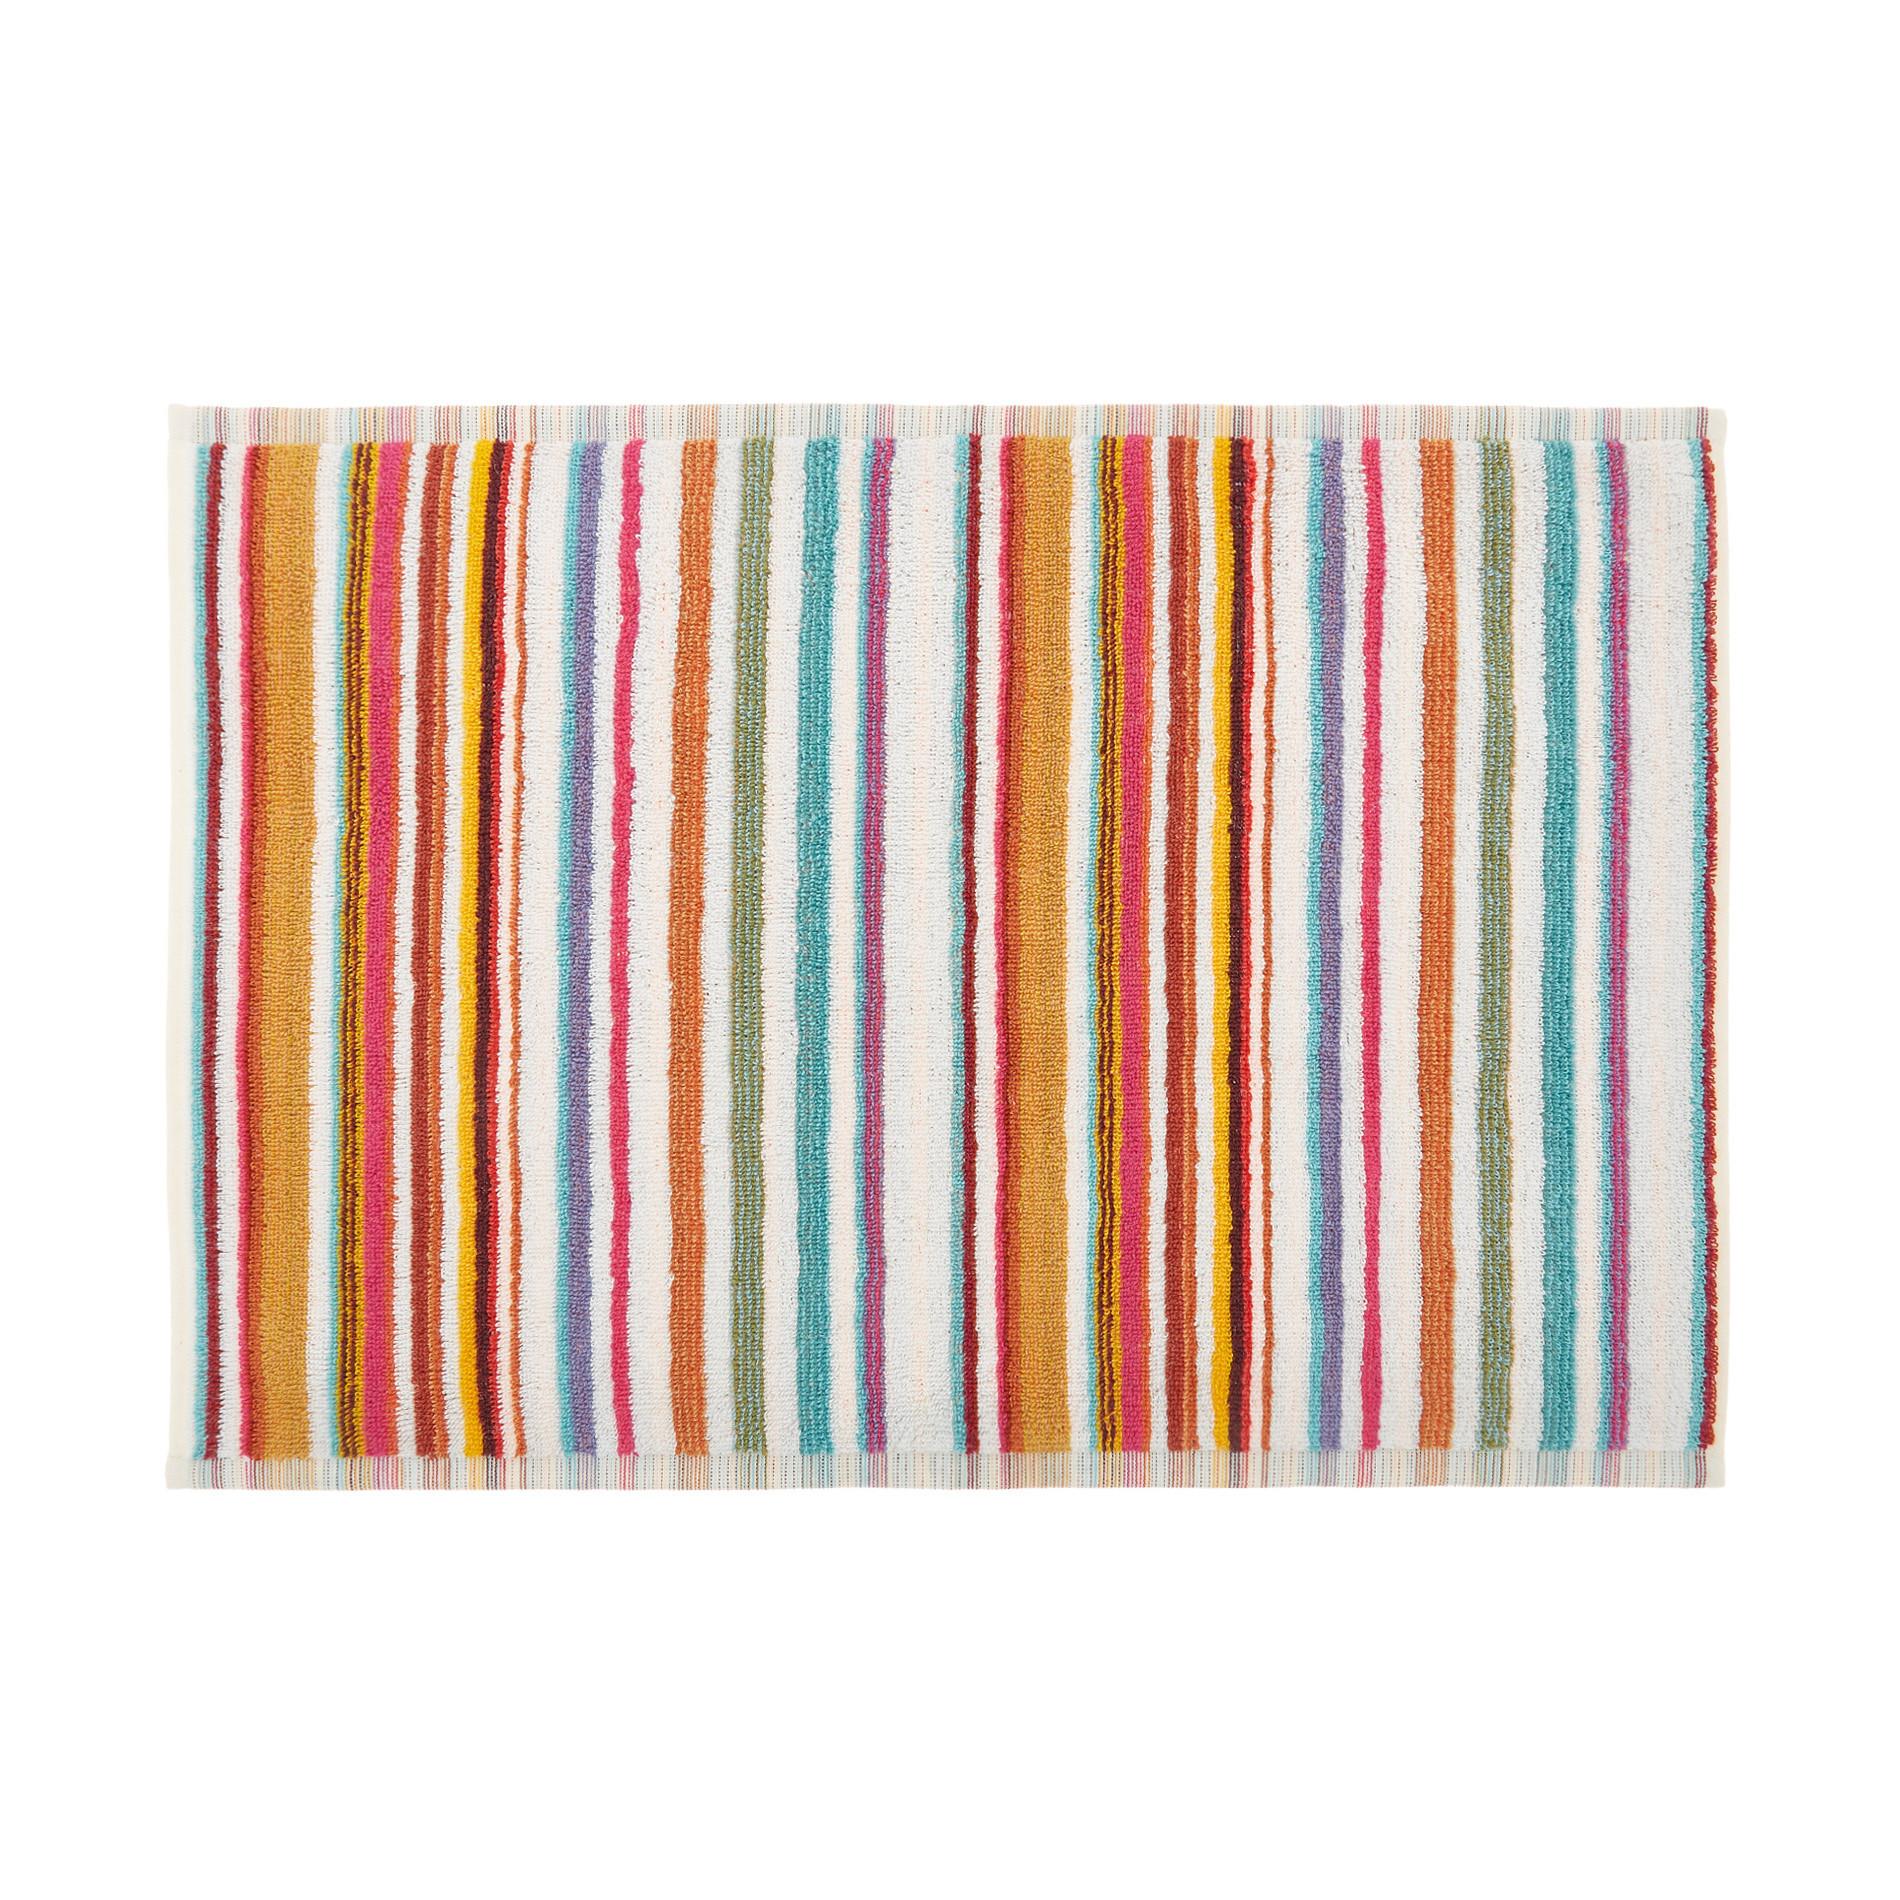 Asciugamano cotone tinto filo a righe, Arancione, large image number 2